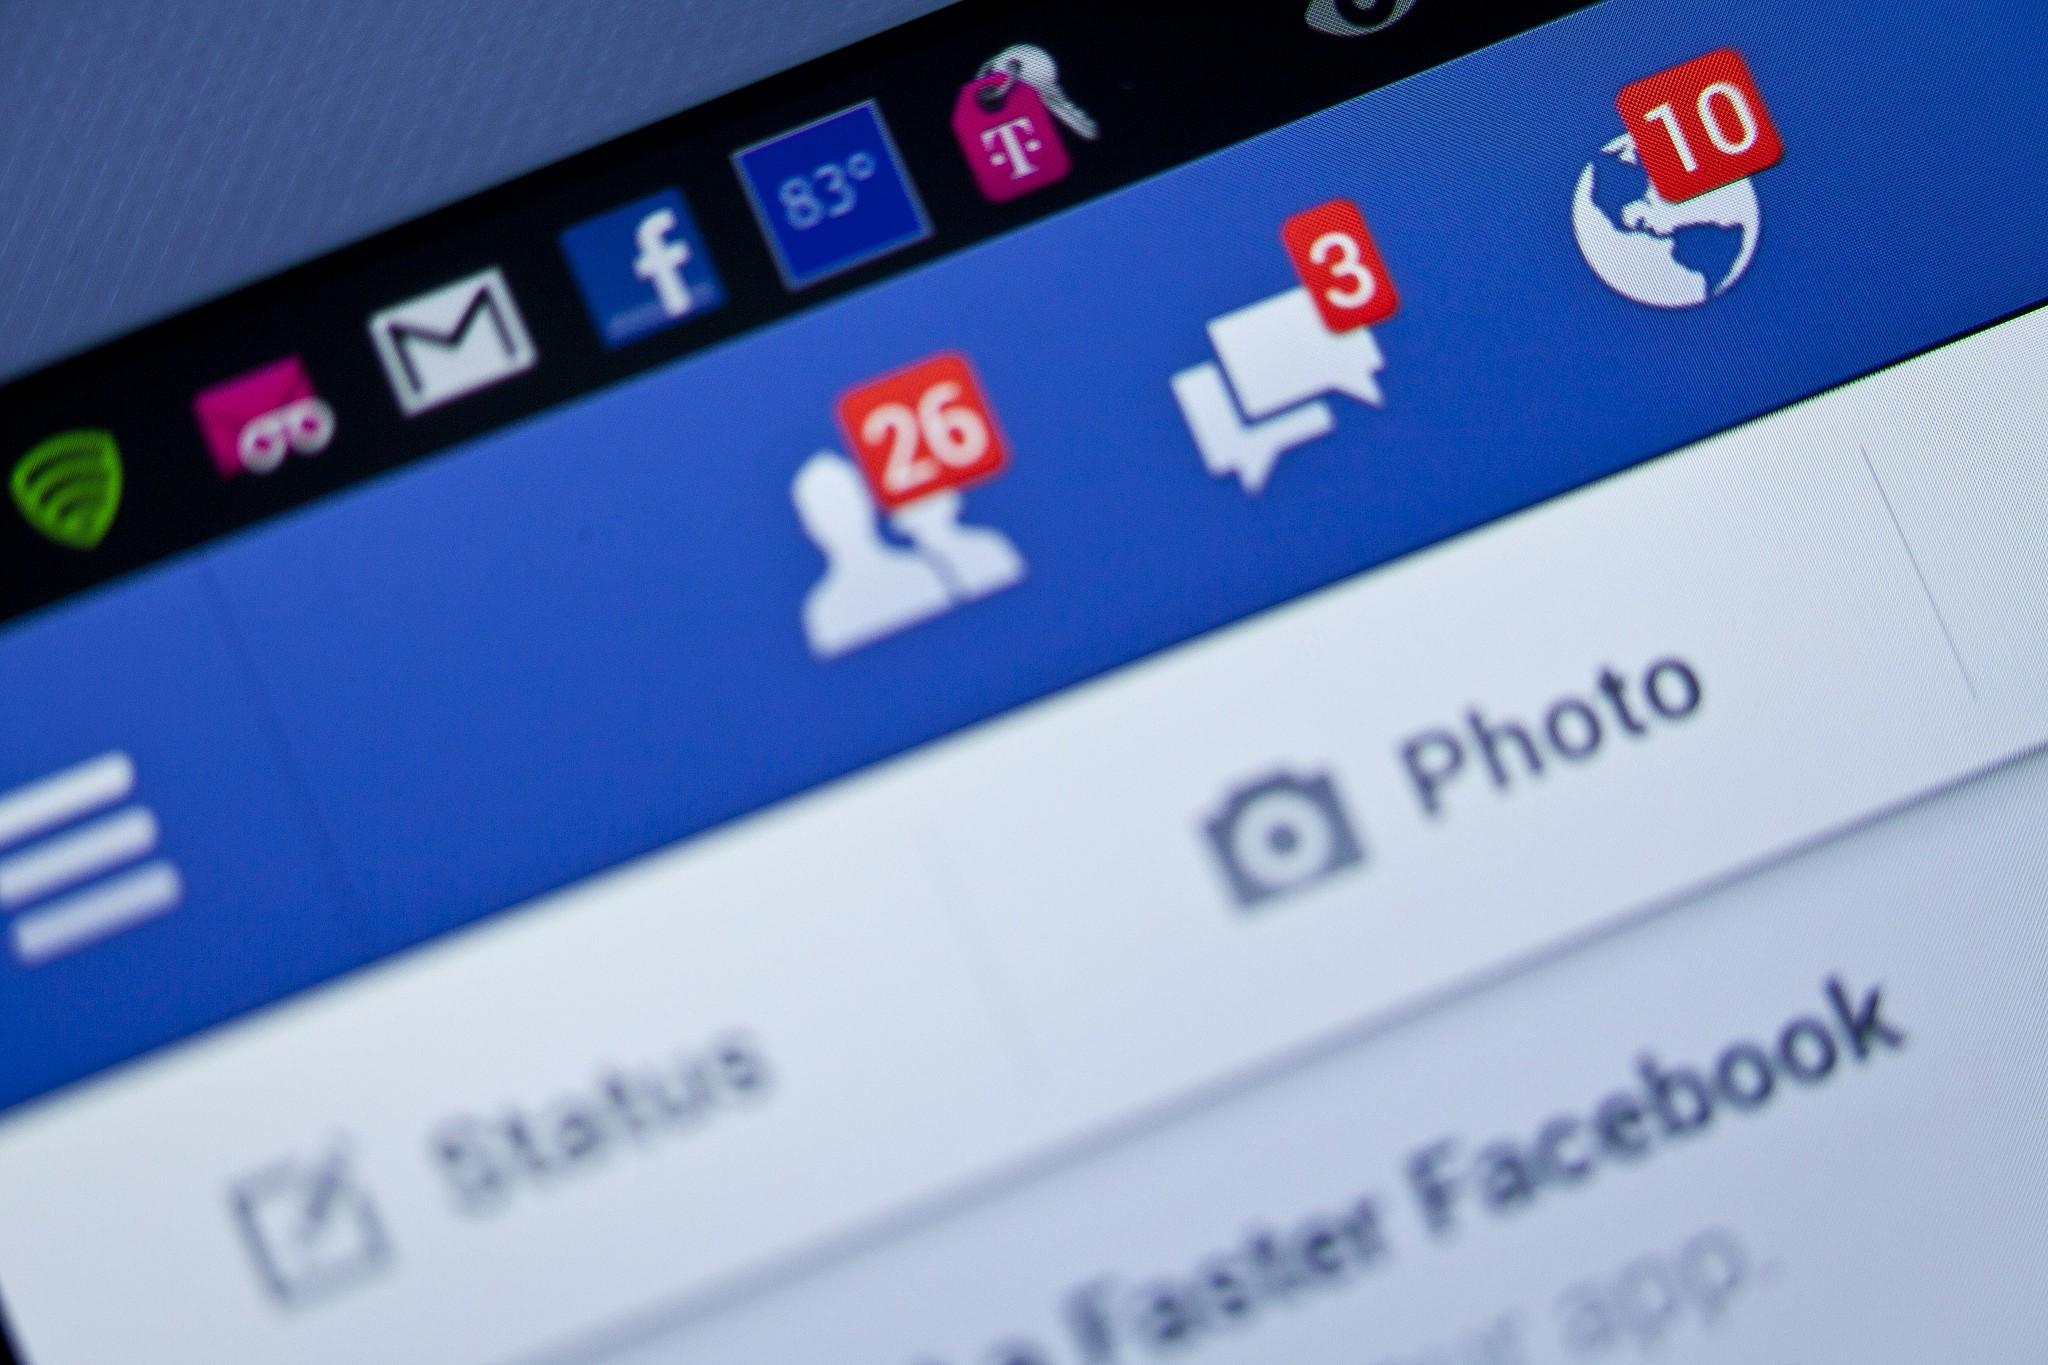 Roskomnadzor to block Facebook in 2018?